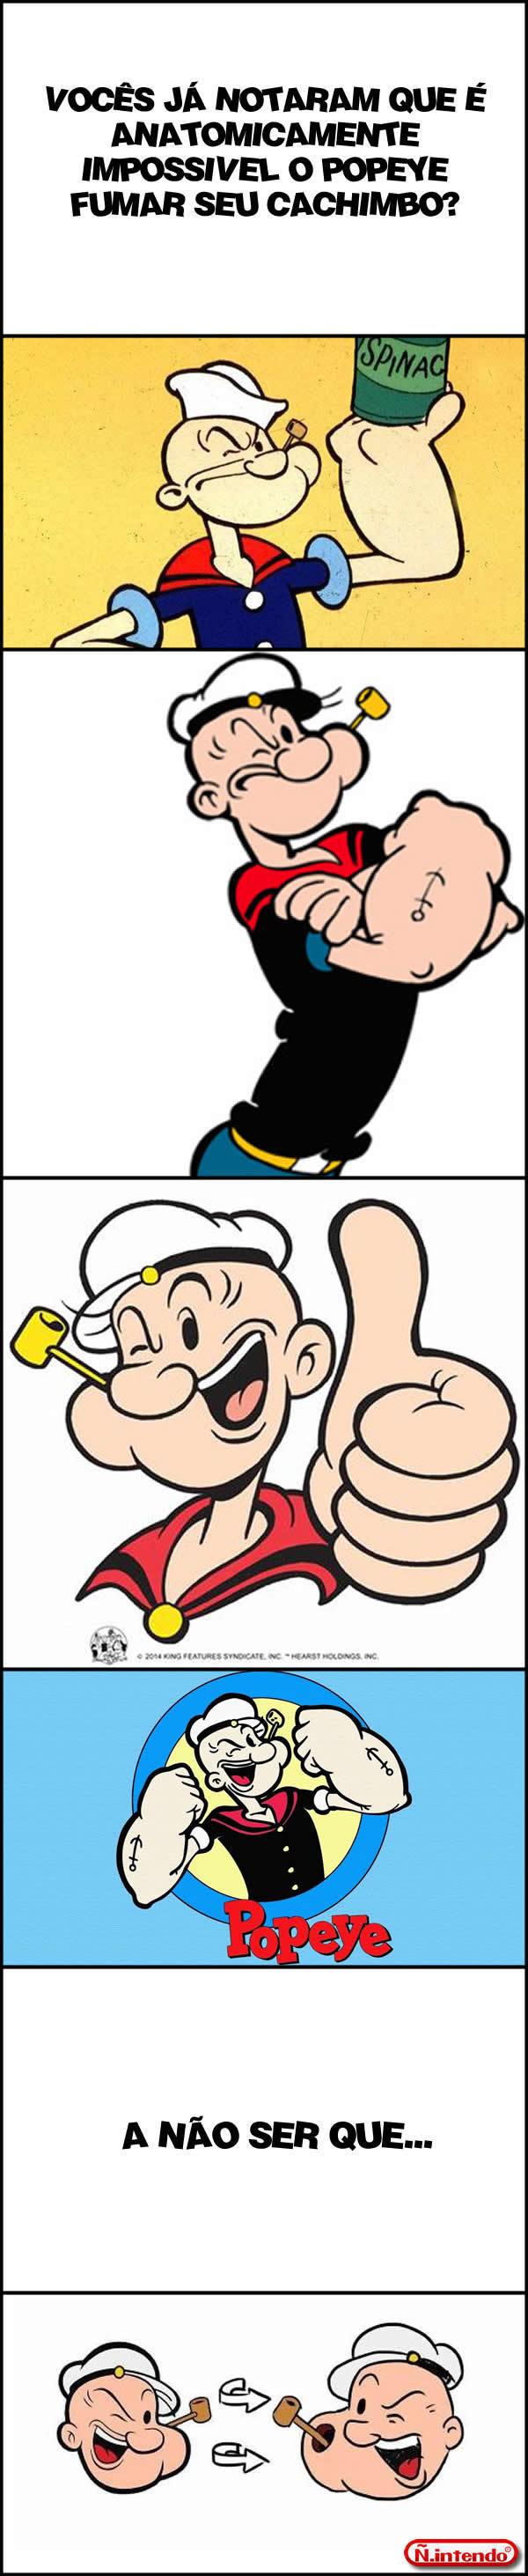 Problemas Anatomicos No Popeye